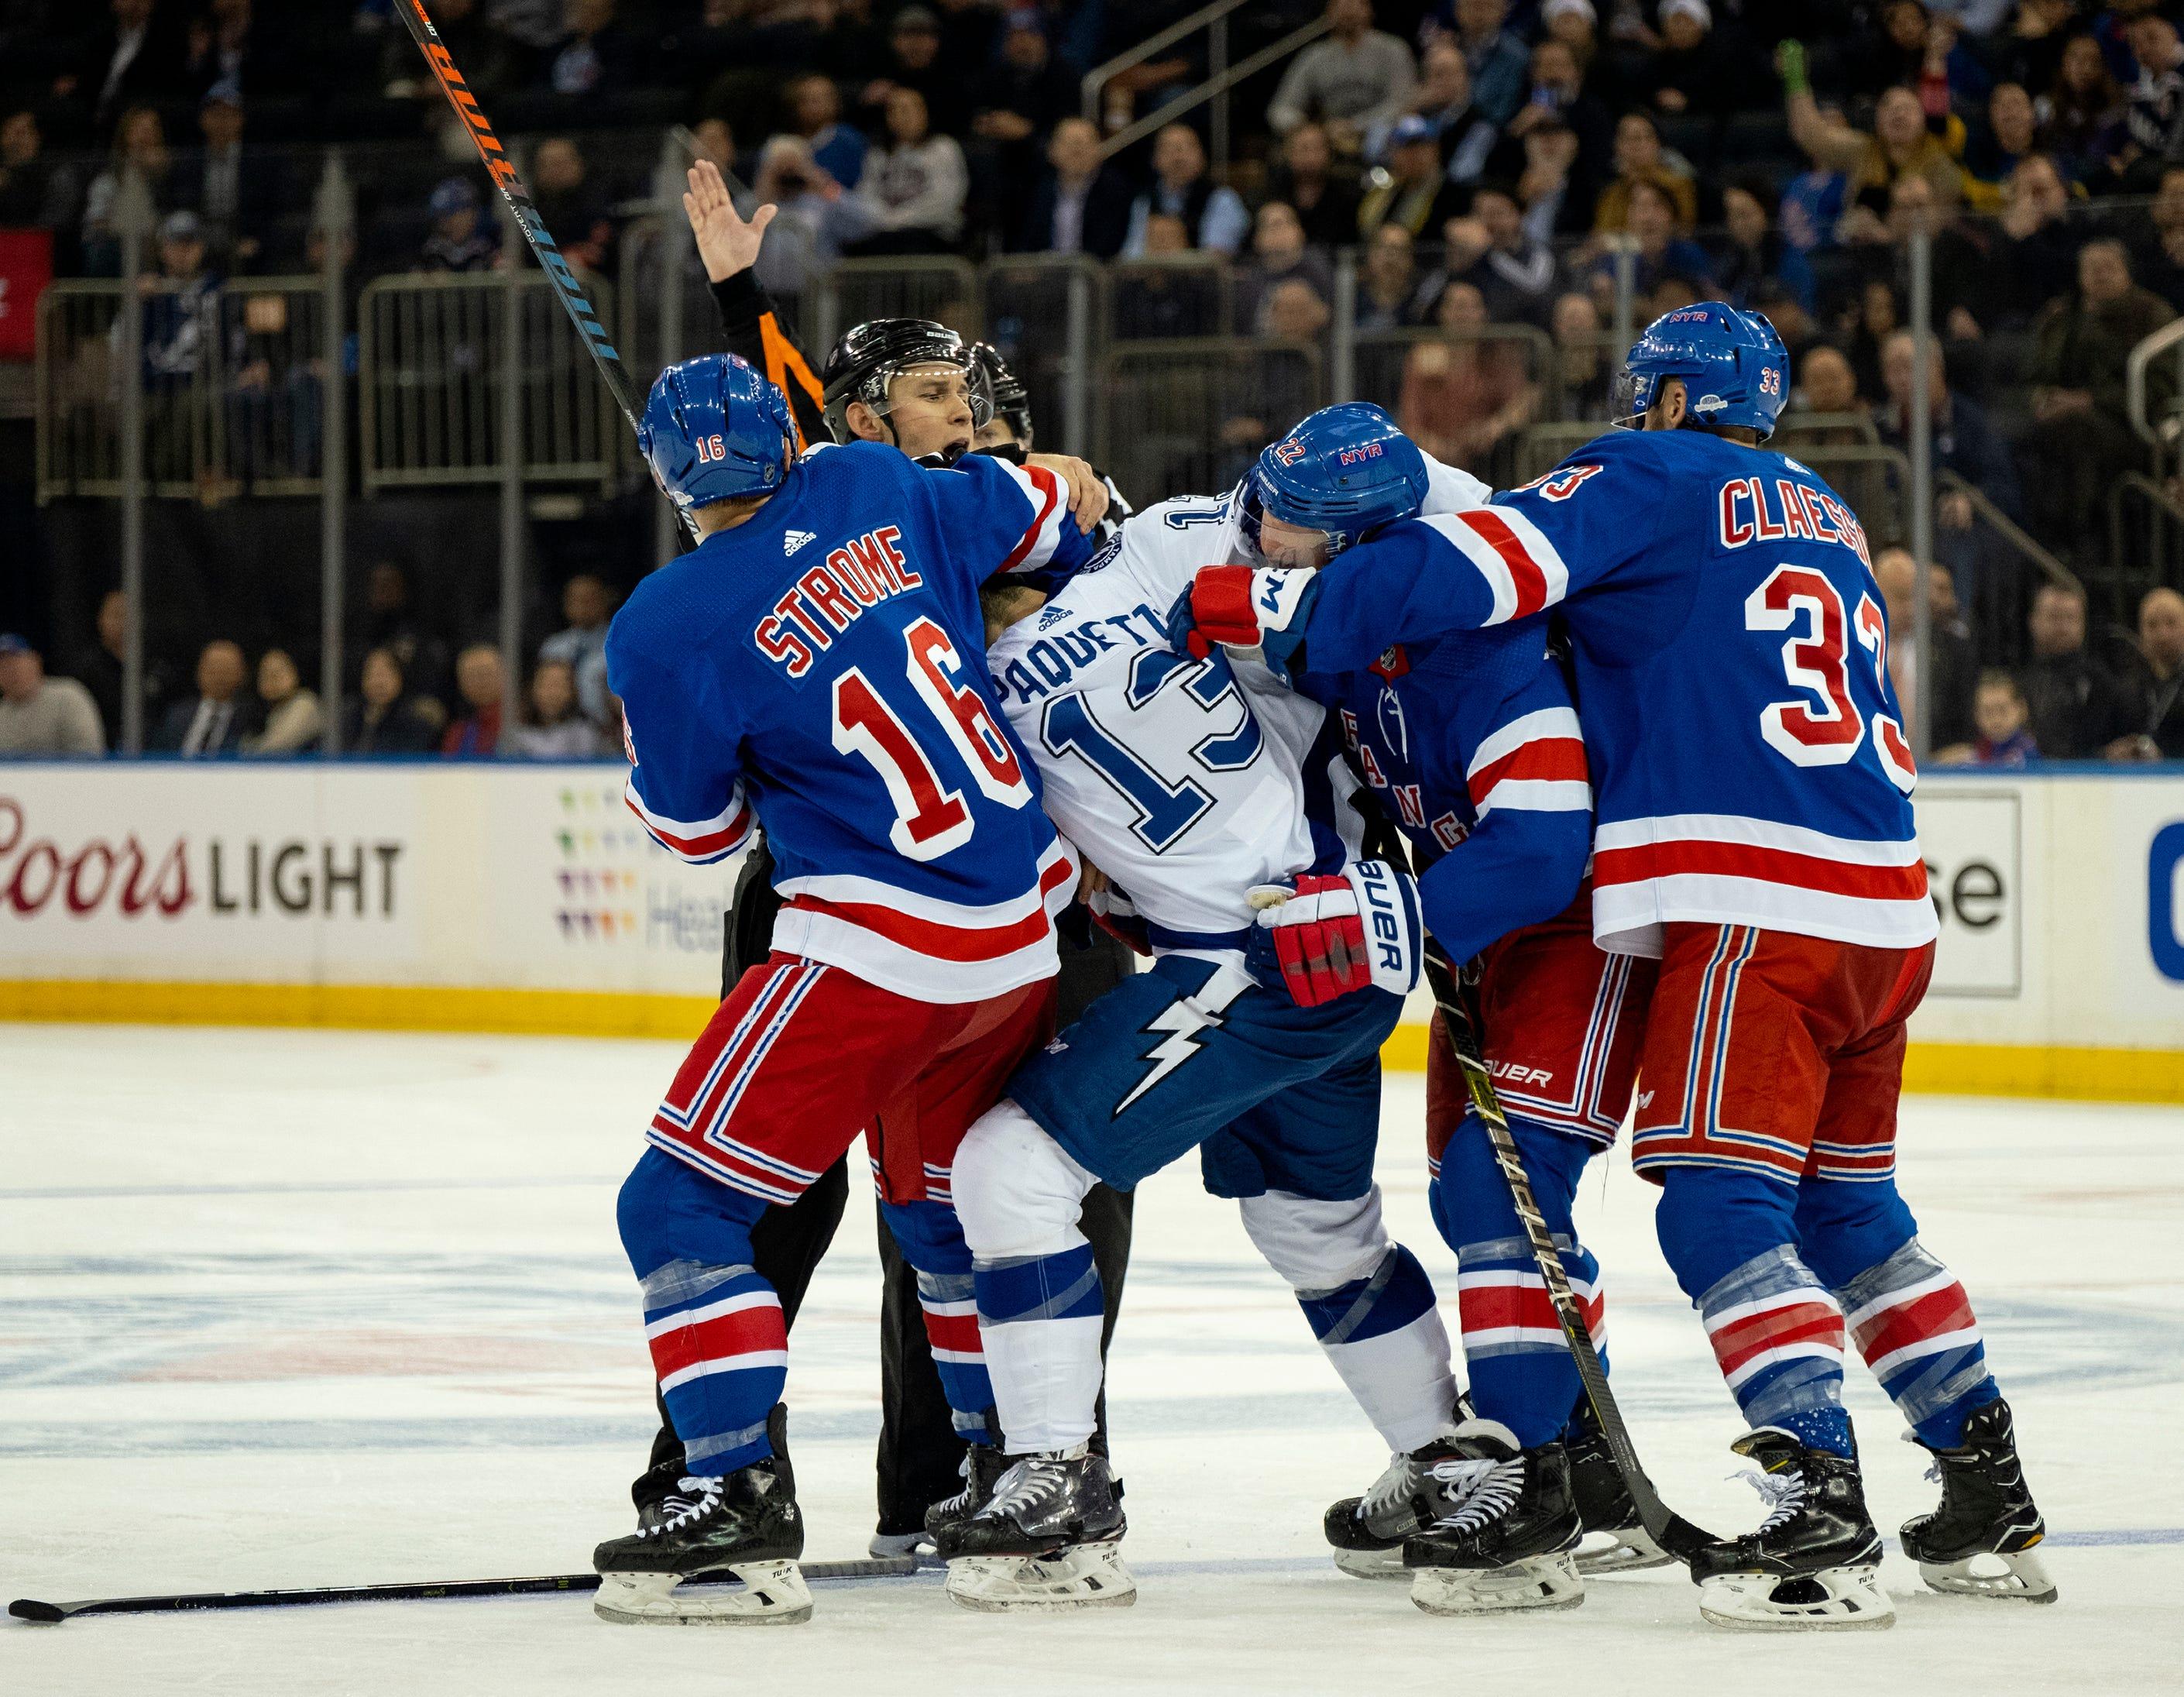 Lightning win 10th straight, top Rangers 4-3 in OT